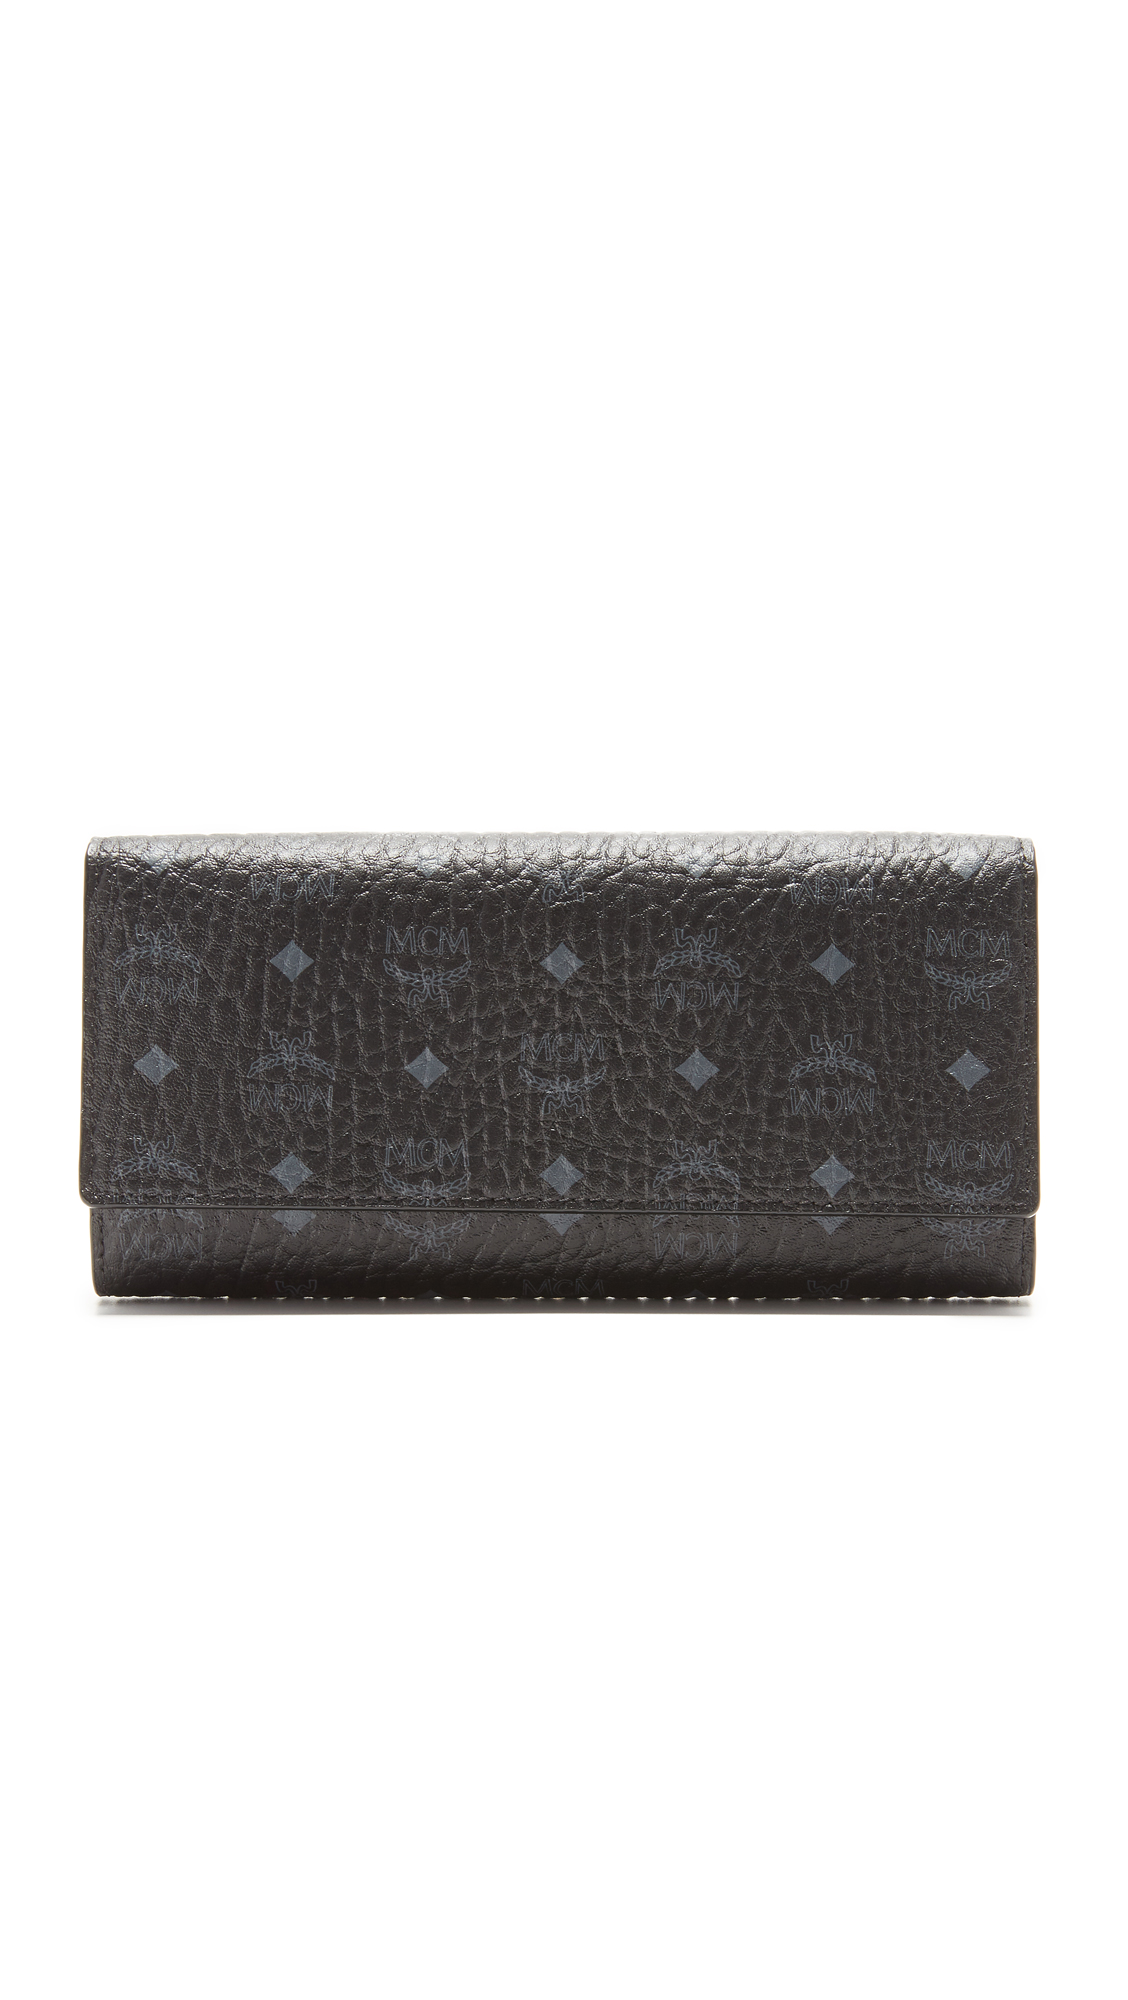 MCM Trifold Wallet - Black